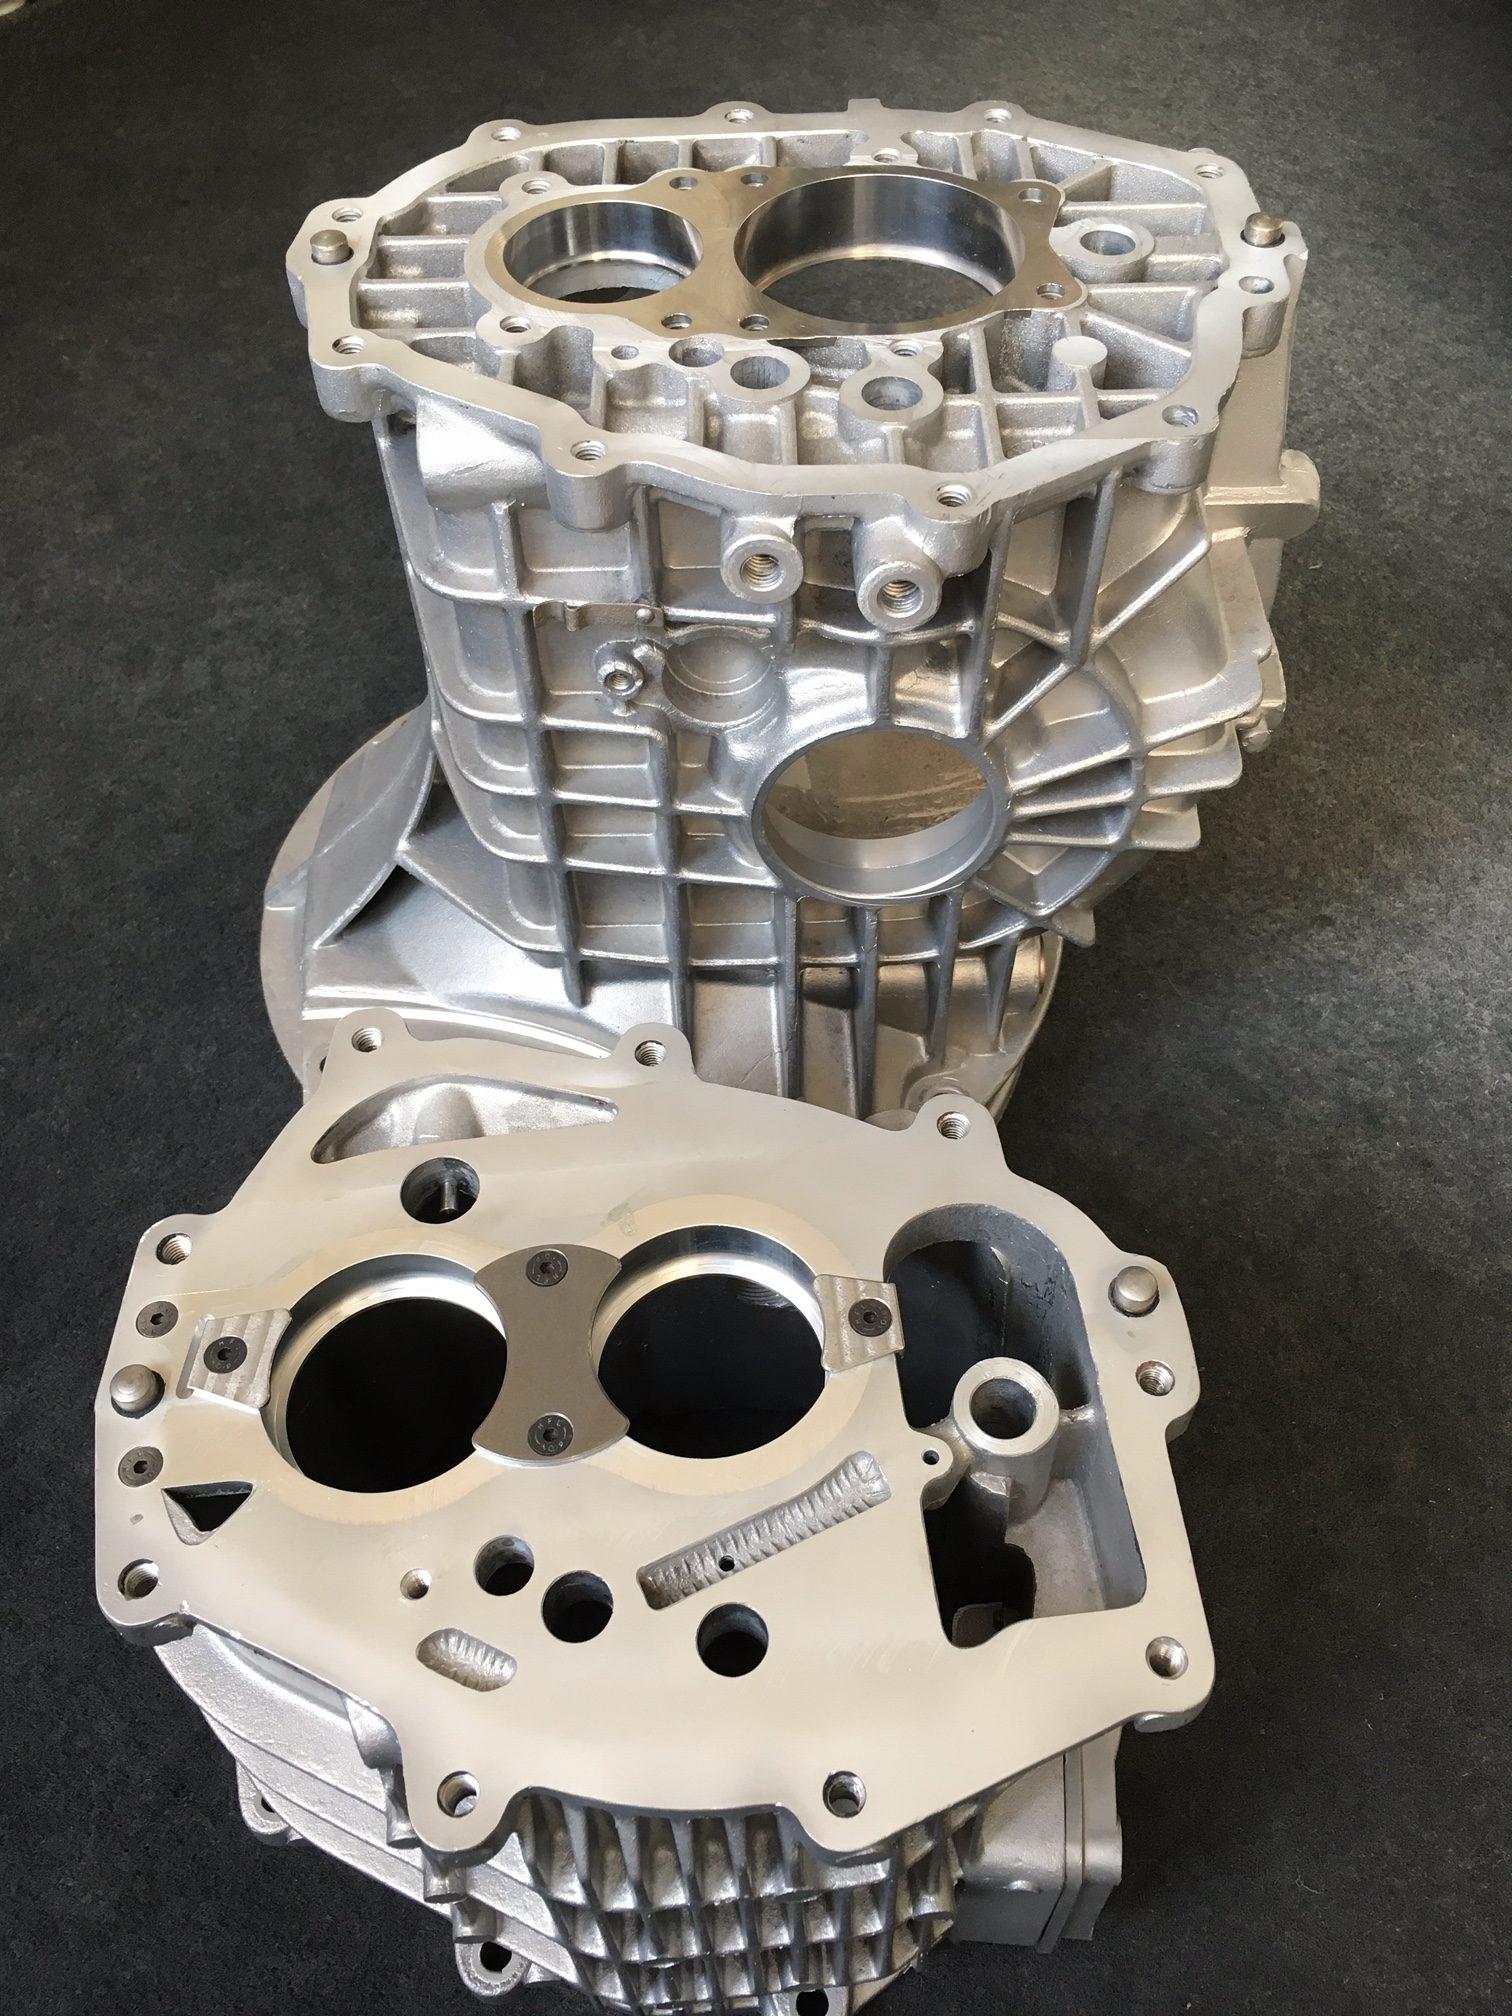 Porsche 915 with WEVO bearing insert.